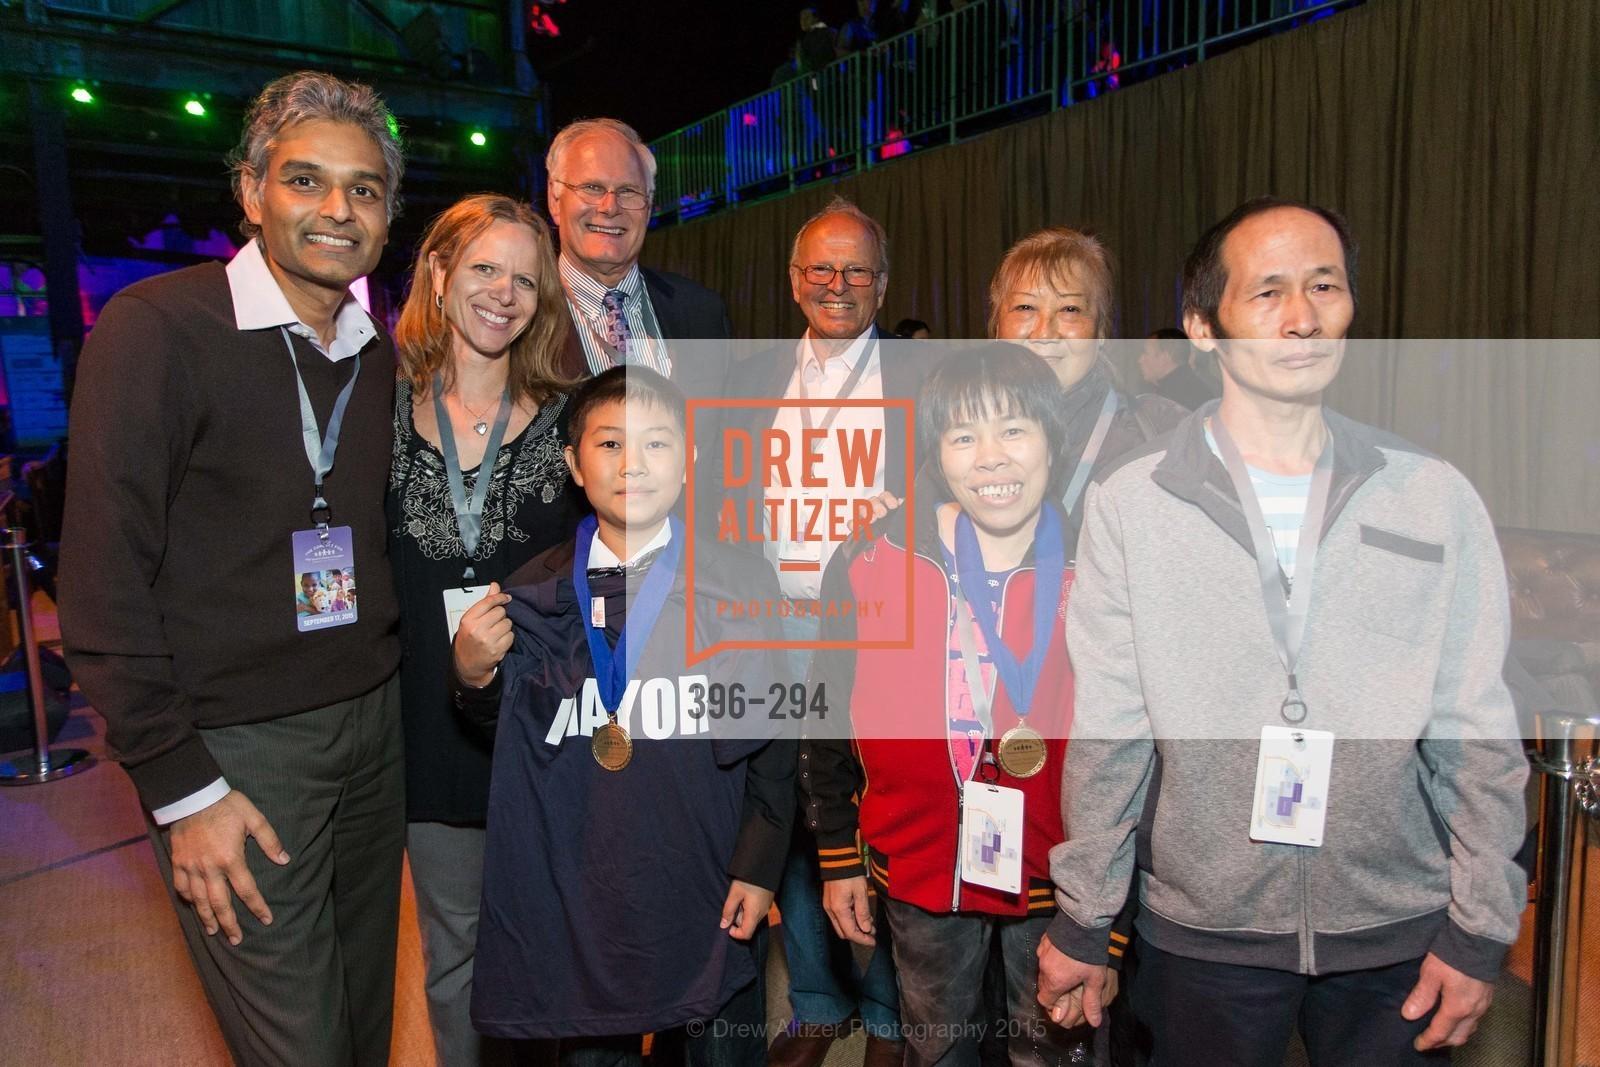 Anu Agrawal, Jennifer Michlitsch, Mark Laret, Zhenkang Zhao, Burt Lubin, The Concert For UCSF Benioff Children's Hospital, Pier 70, September 17th, 2015